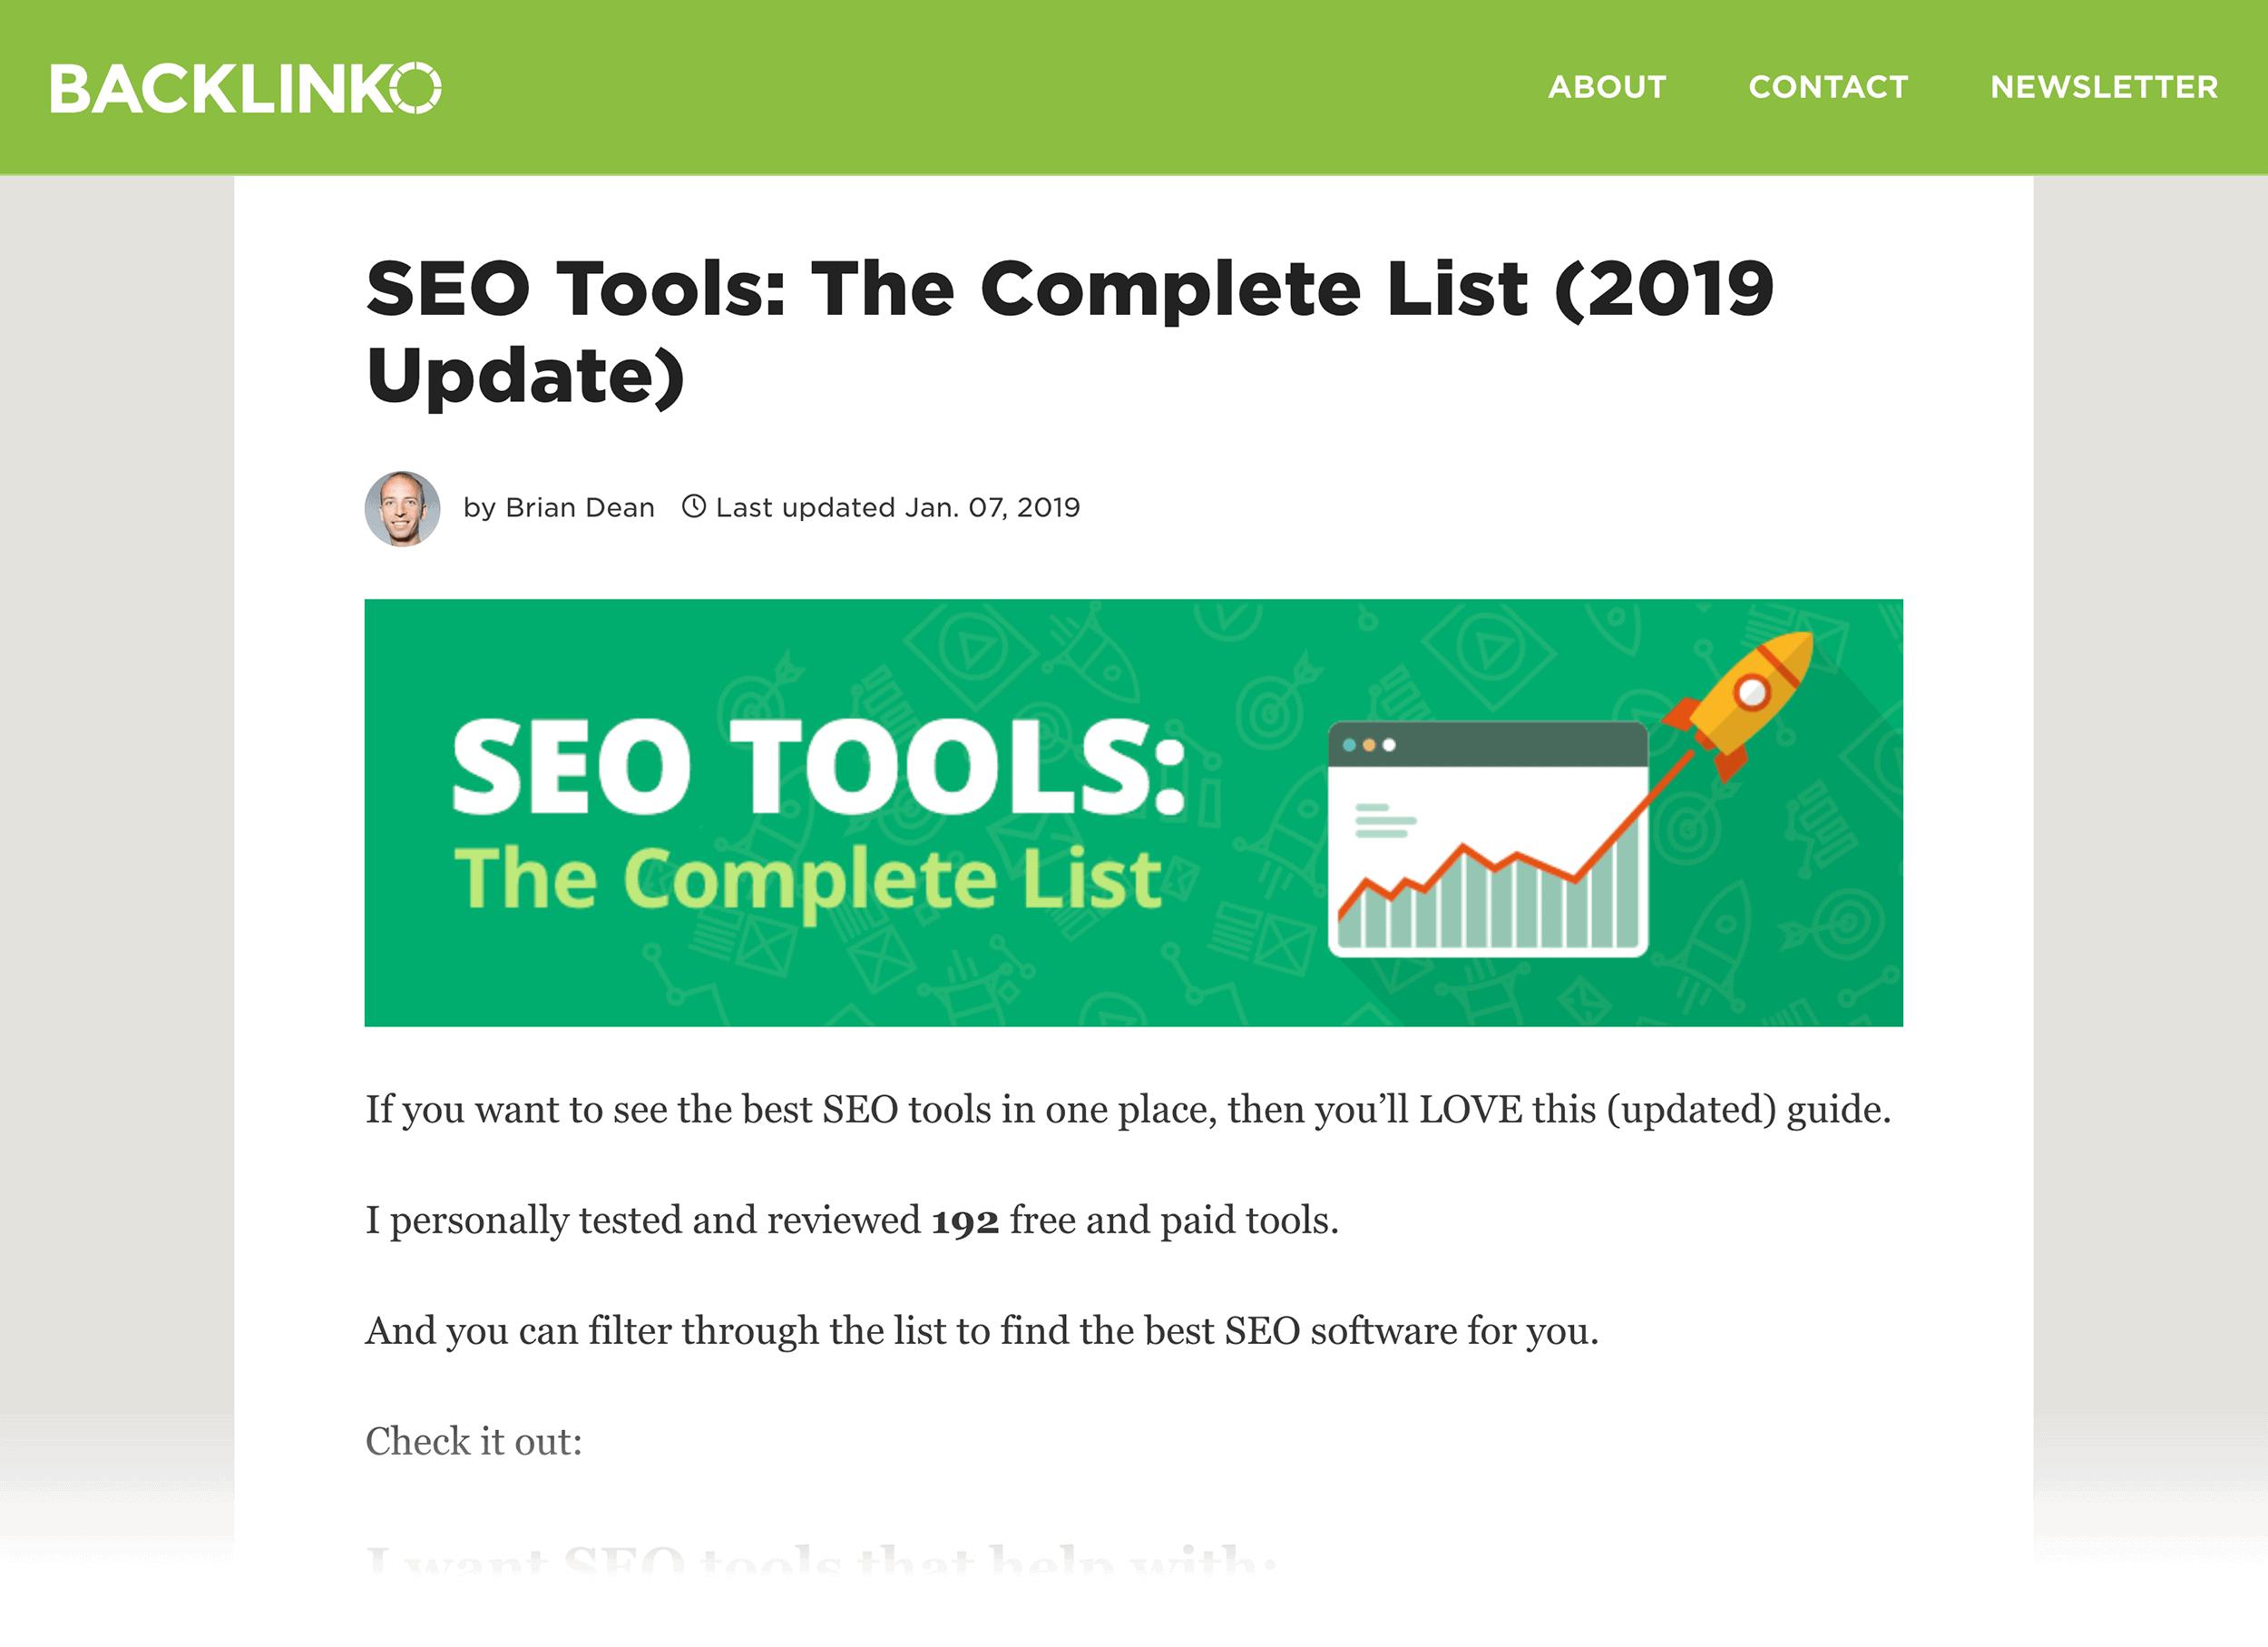 SEO Tools post – Backlinko